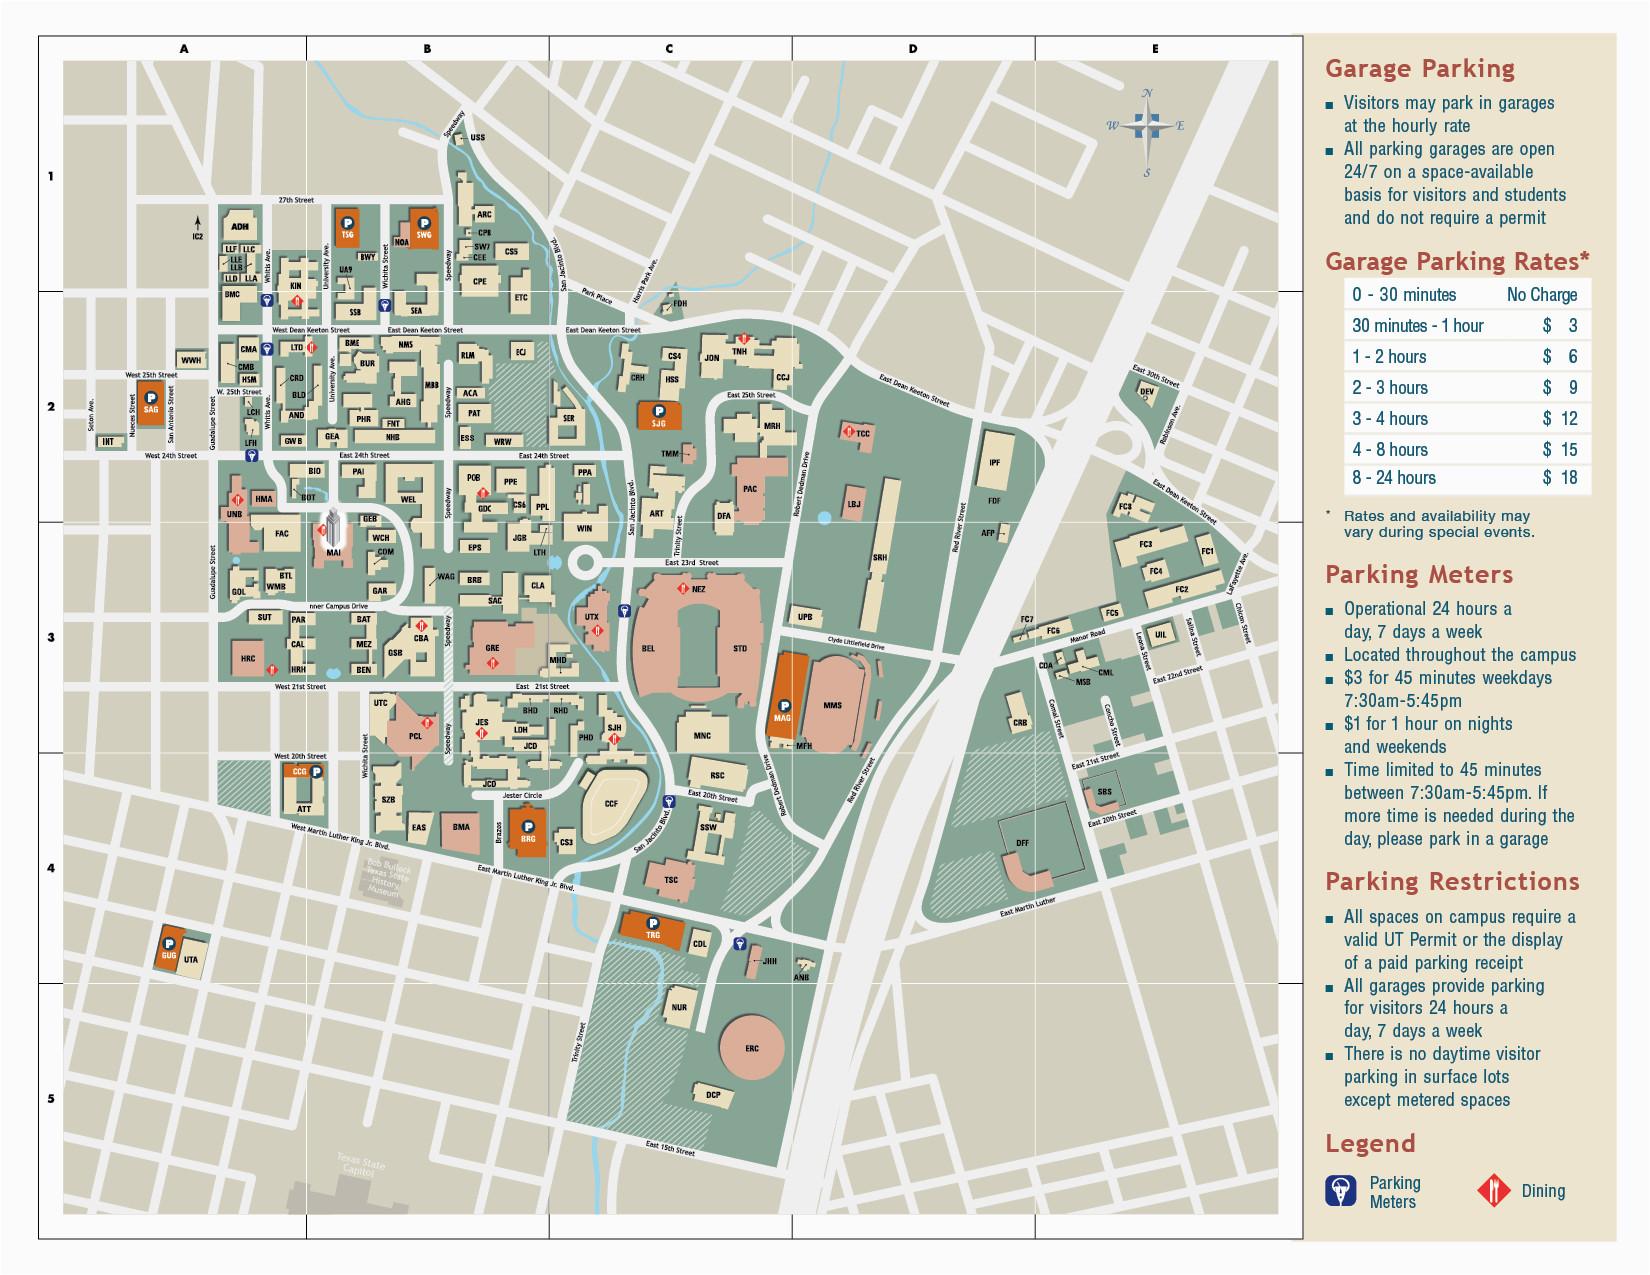 University Of Colorado Boulder Campus Map University Of Texas at ...